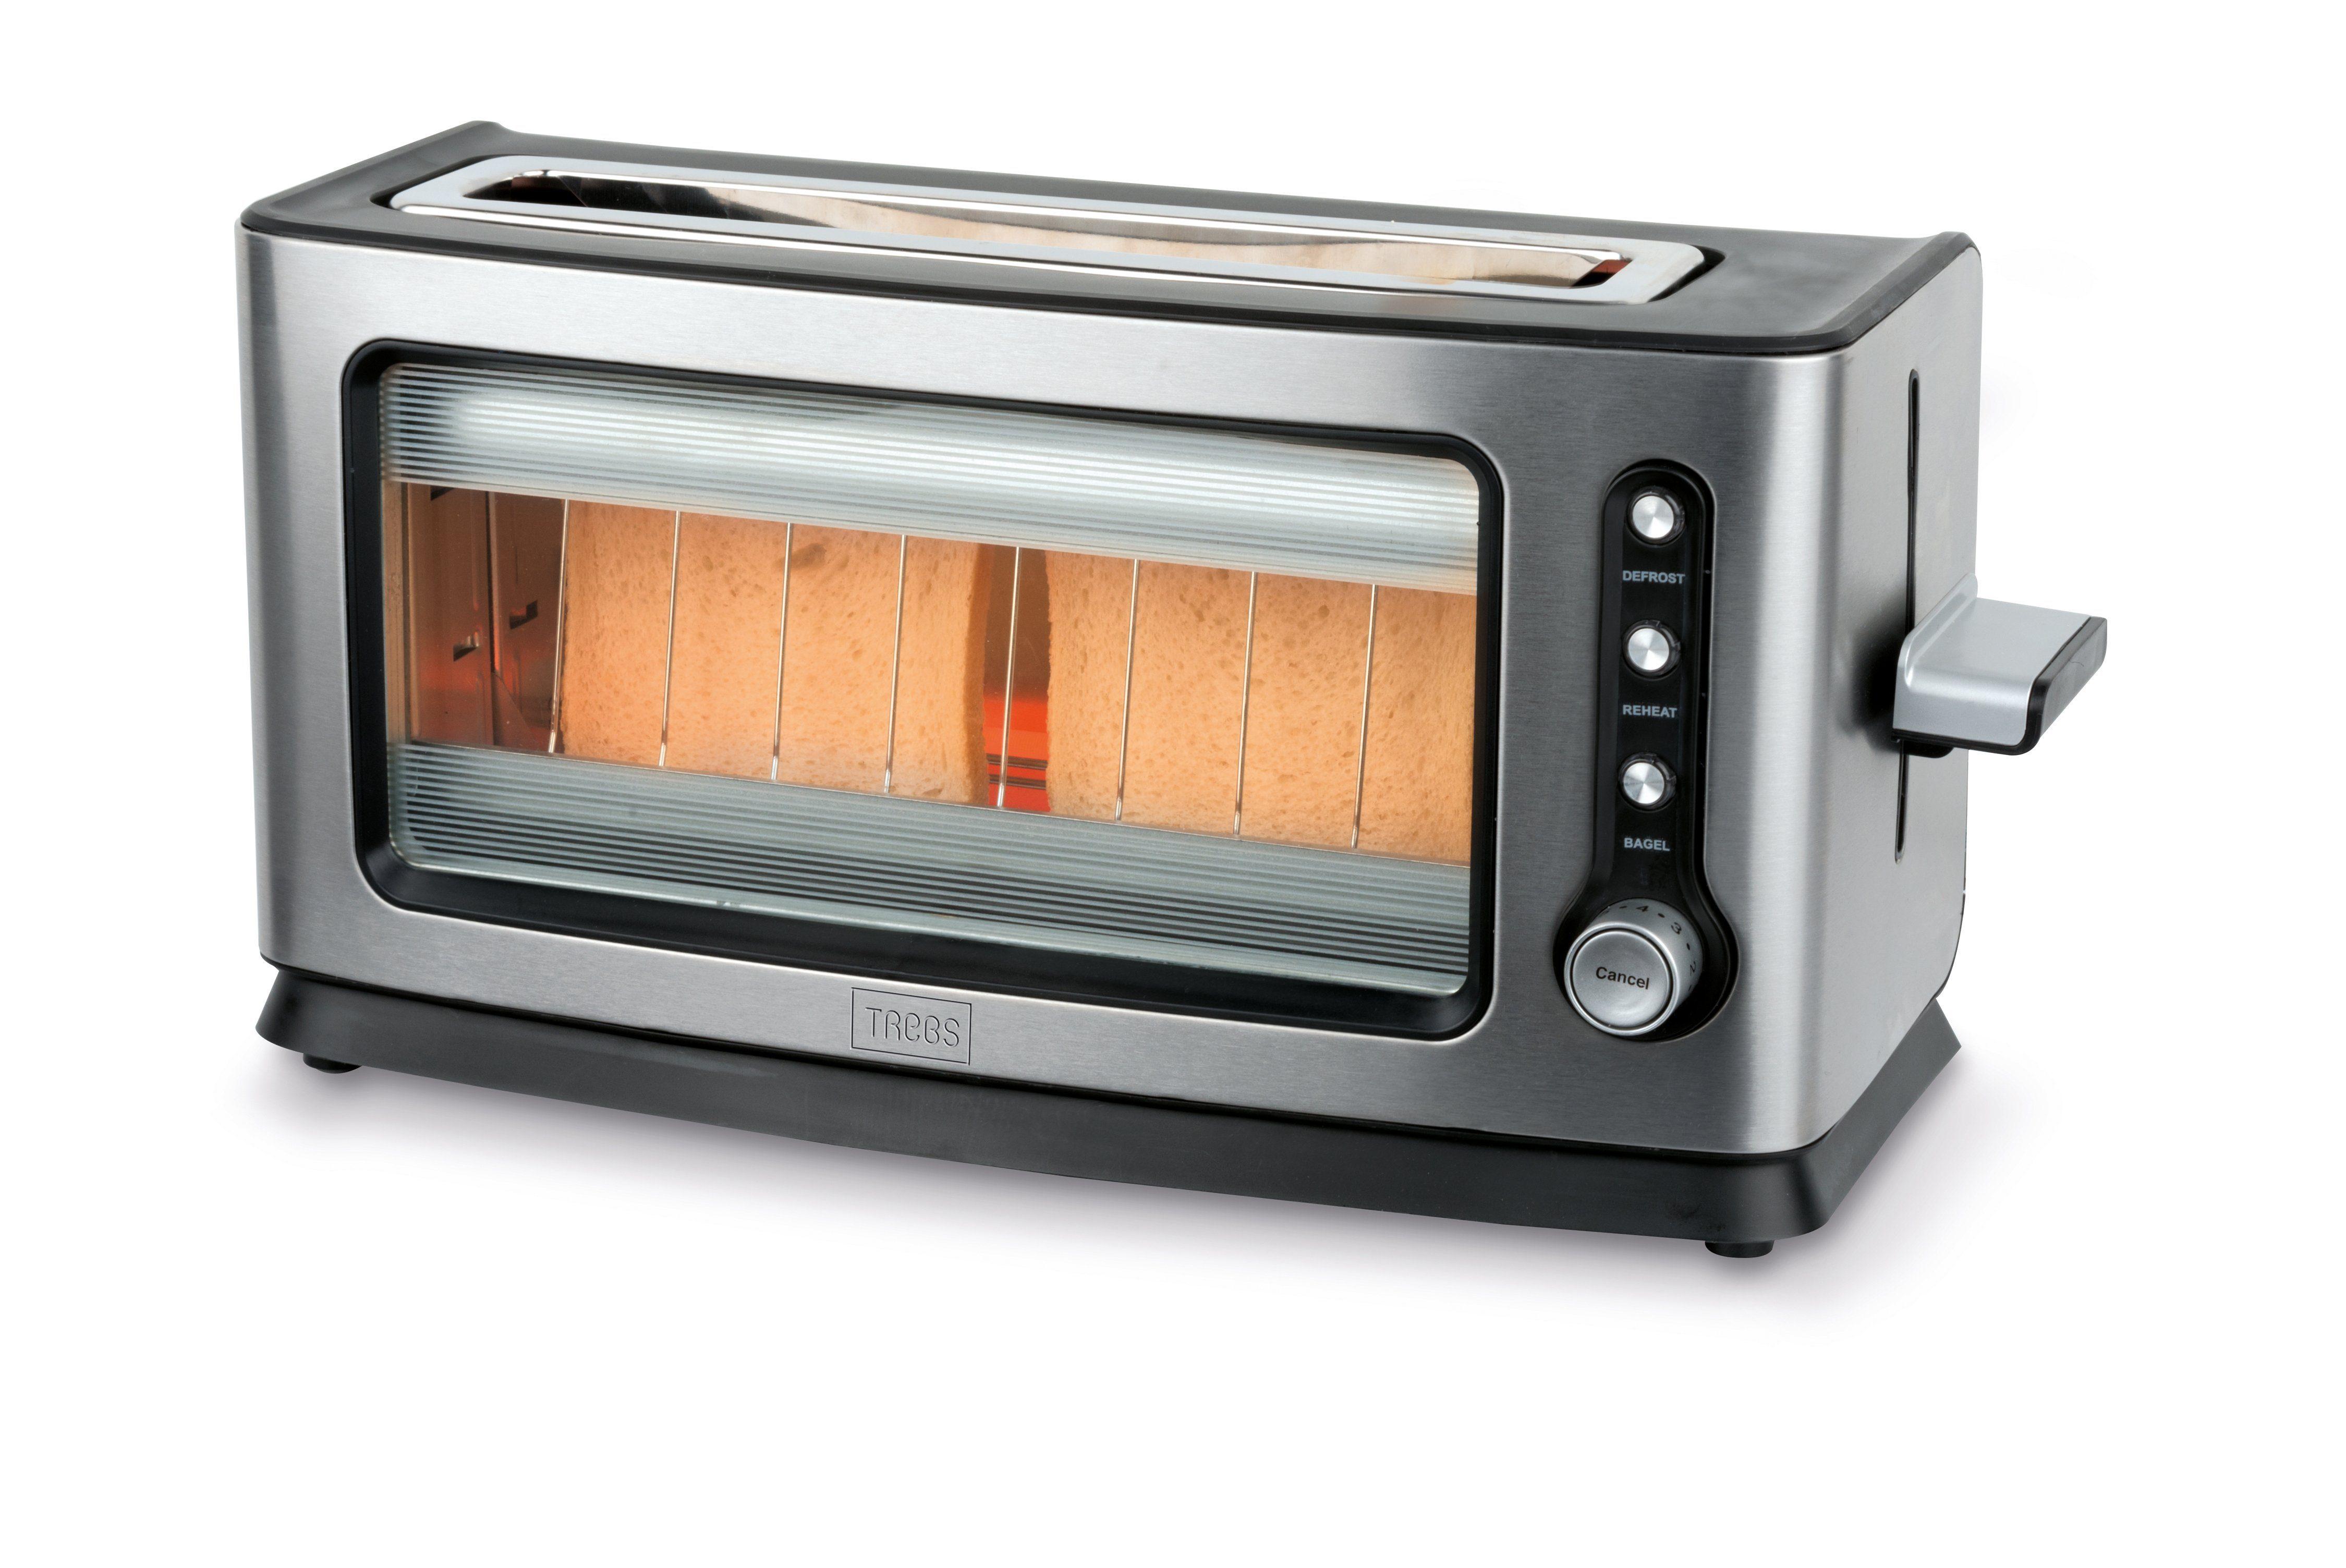 Trebs Infrarot Toaster mit Sichtfenster, 900 W »Comfortcook 99320«